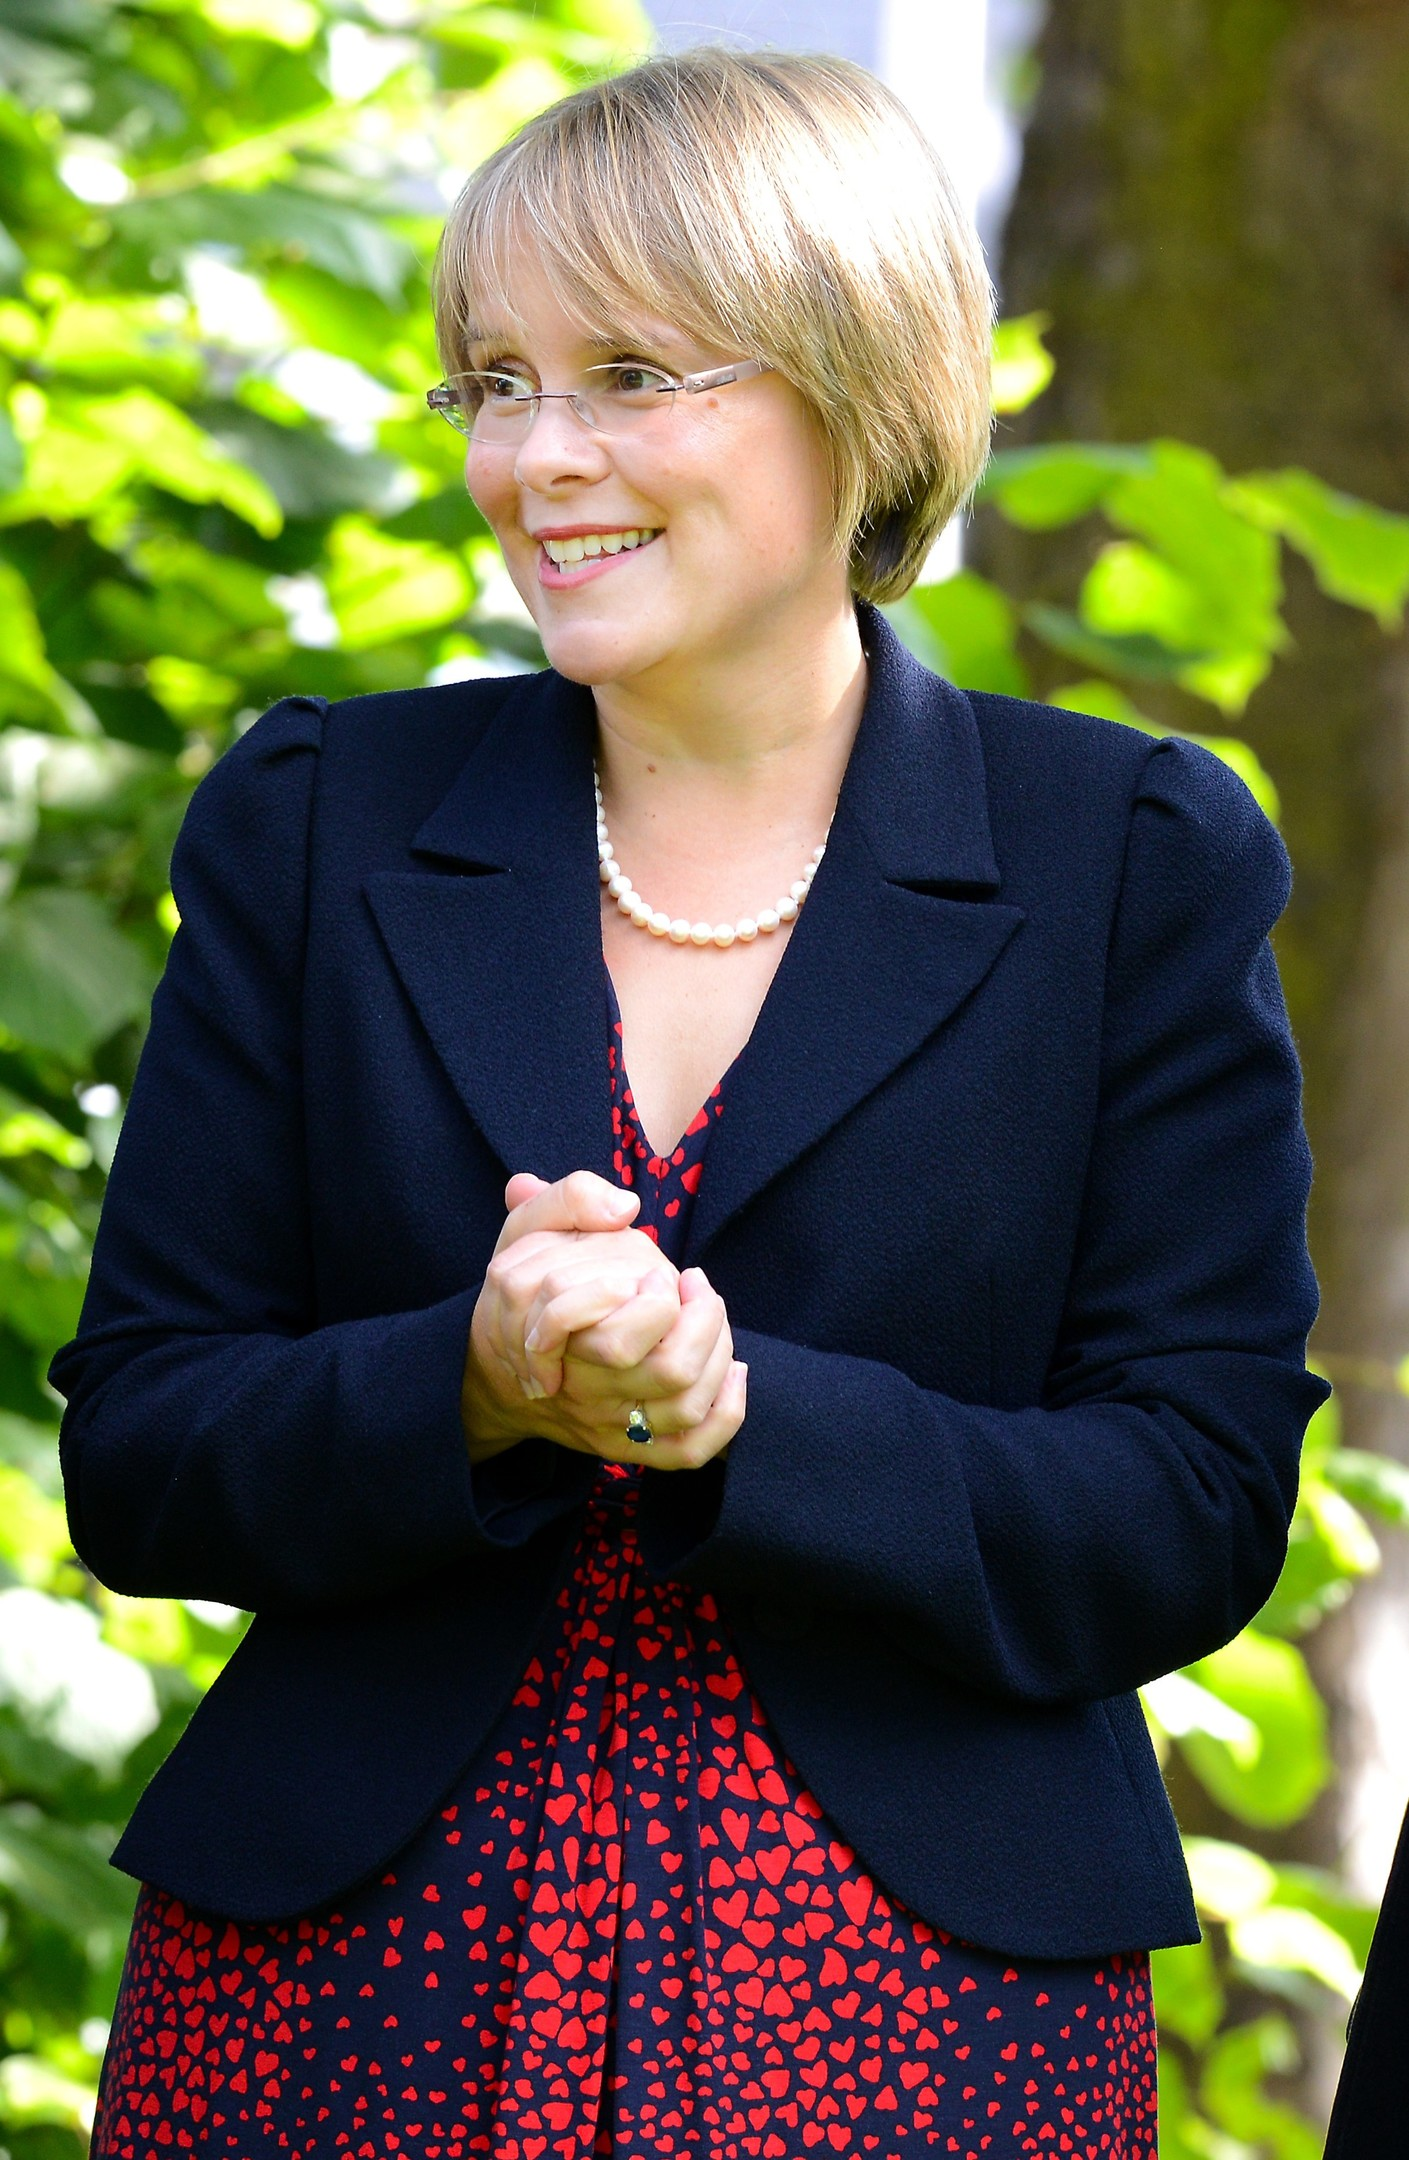 Anna Tomlinson, Headmistress of St Margaret's School for Girls